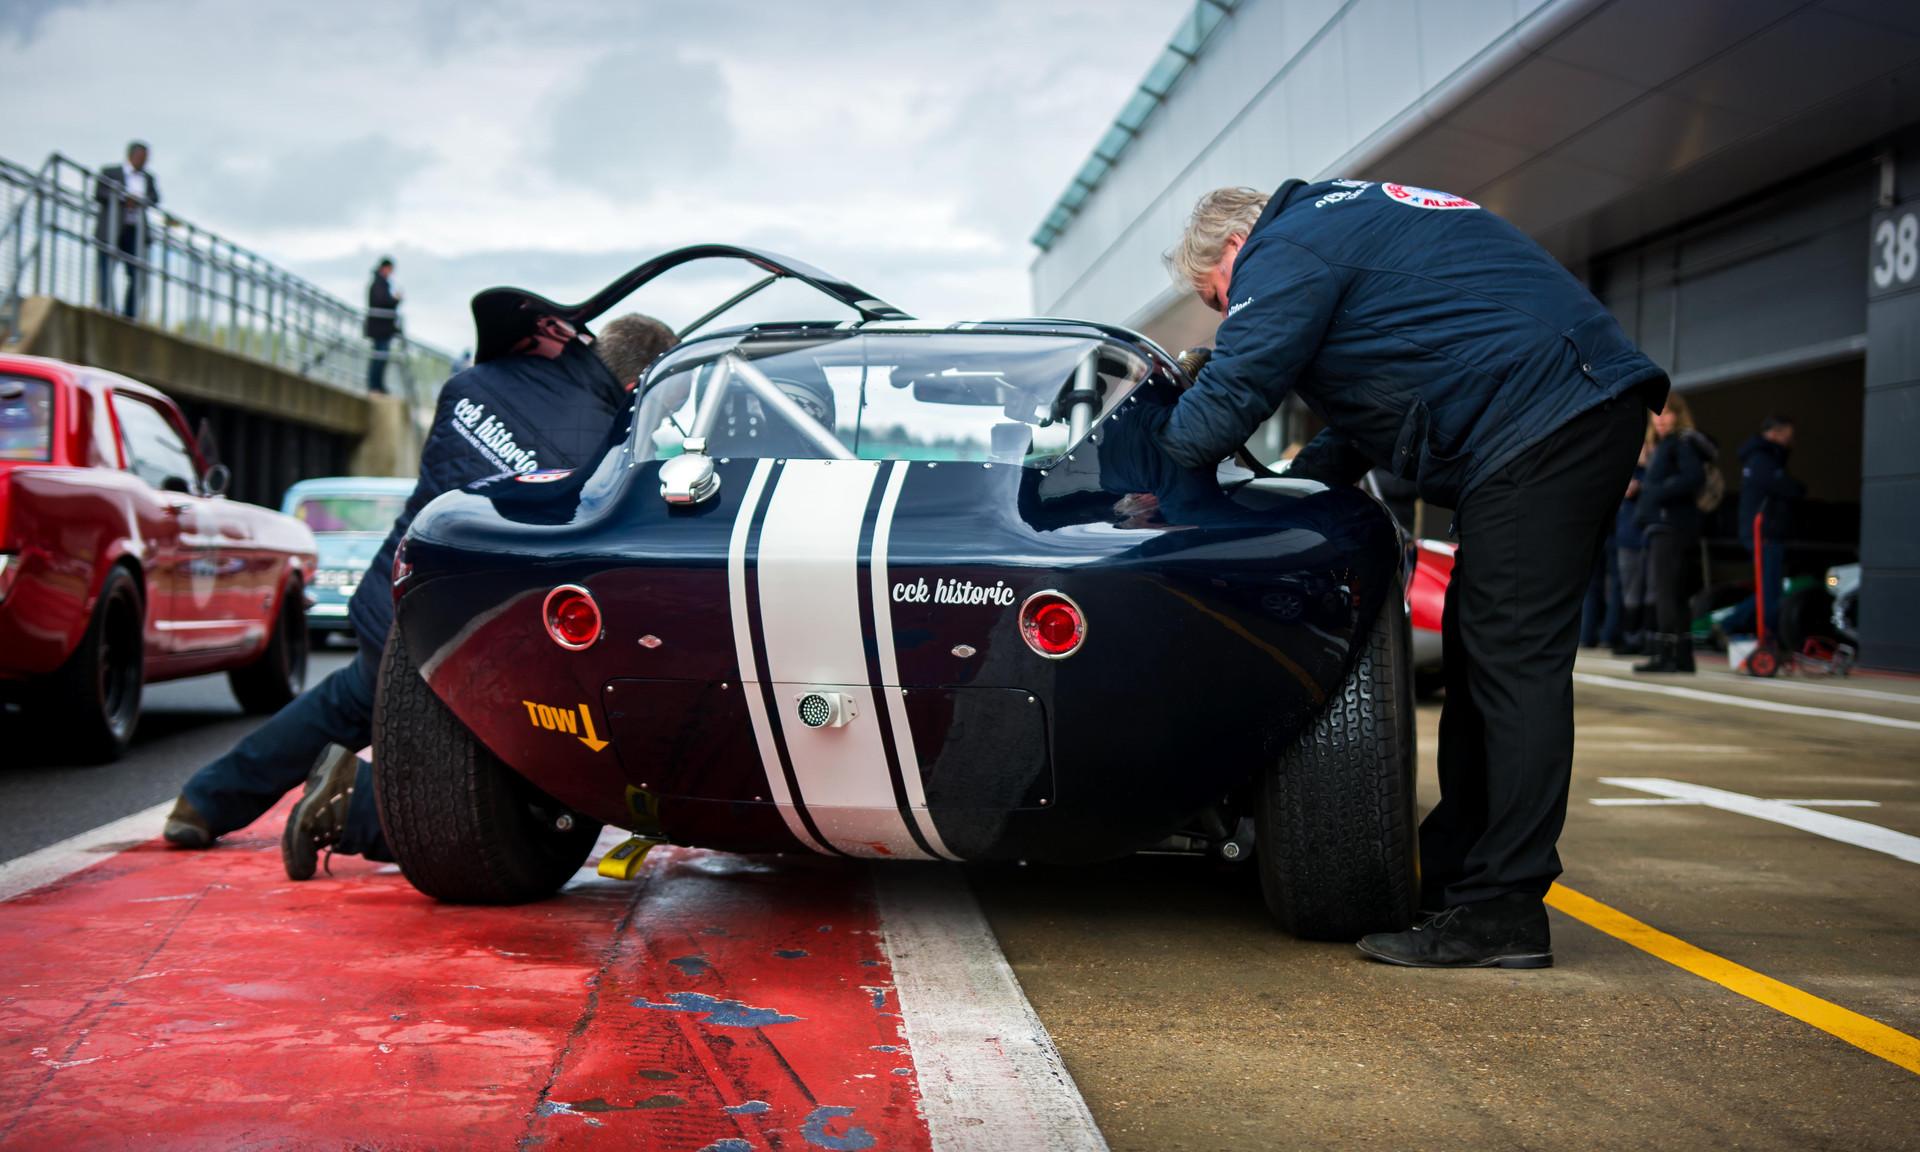 Ian Burford & Shaun Rainford's1964 Cheetah at the 2018 Silverstone Classic Preview Day